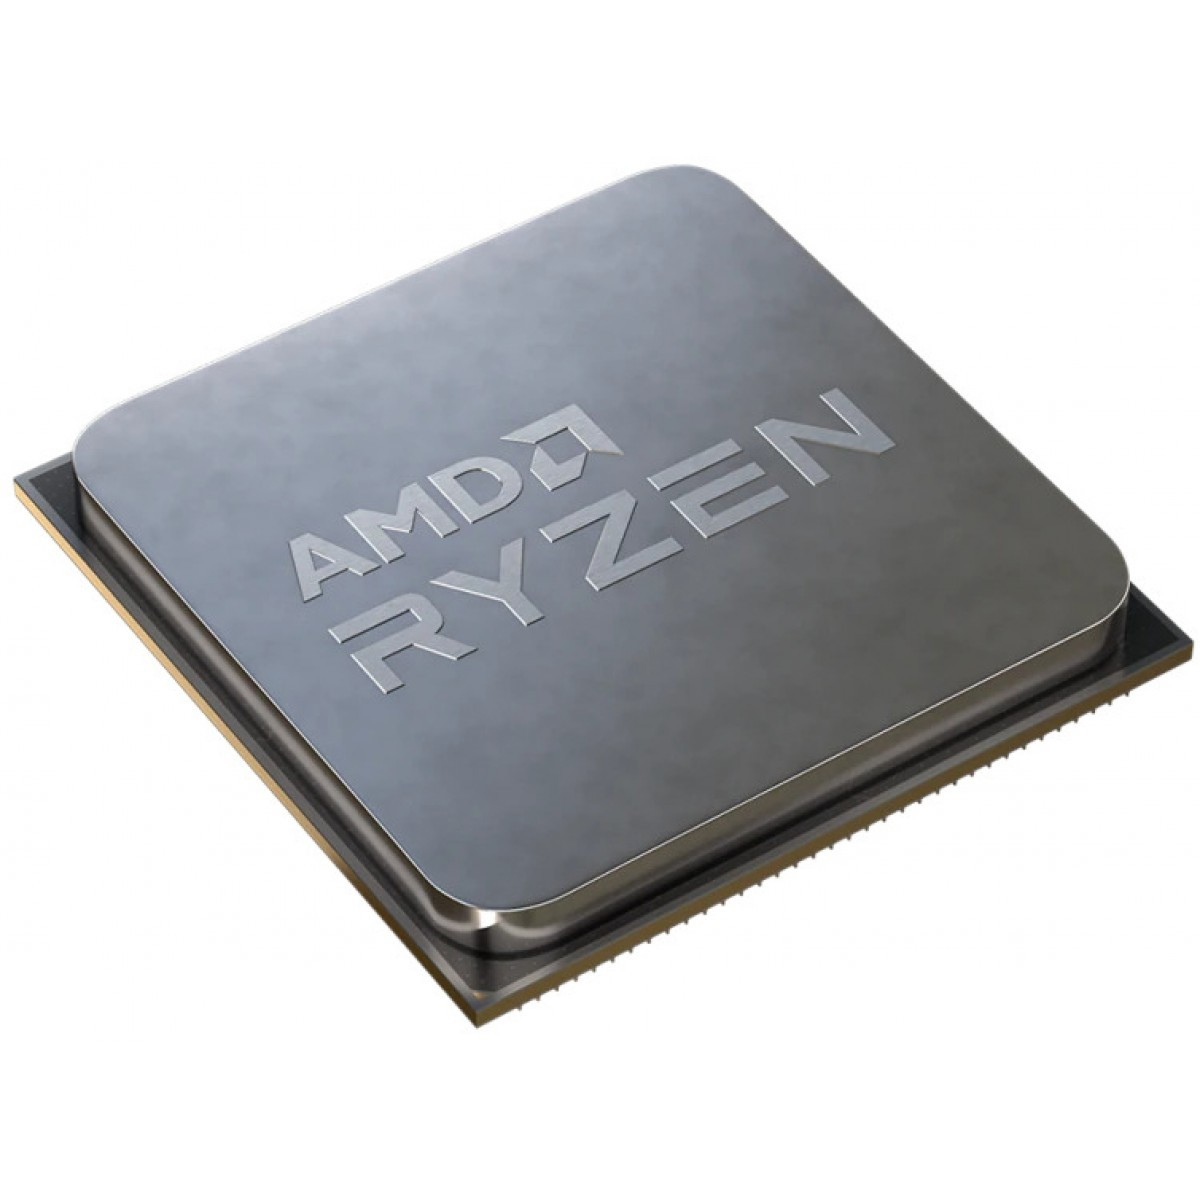 Processador AMD Ryzen 5 5600G 3.9GHz (4.4GHz Turbo), 6-Cores 12-Threads, Cooler Wraith Stealth, AM4, Com vídeo integrado, 100-100000252BOX